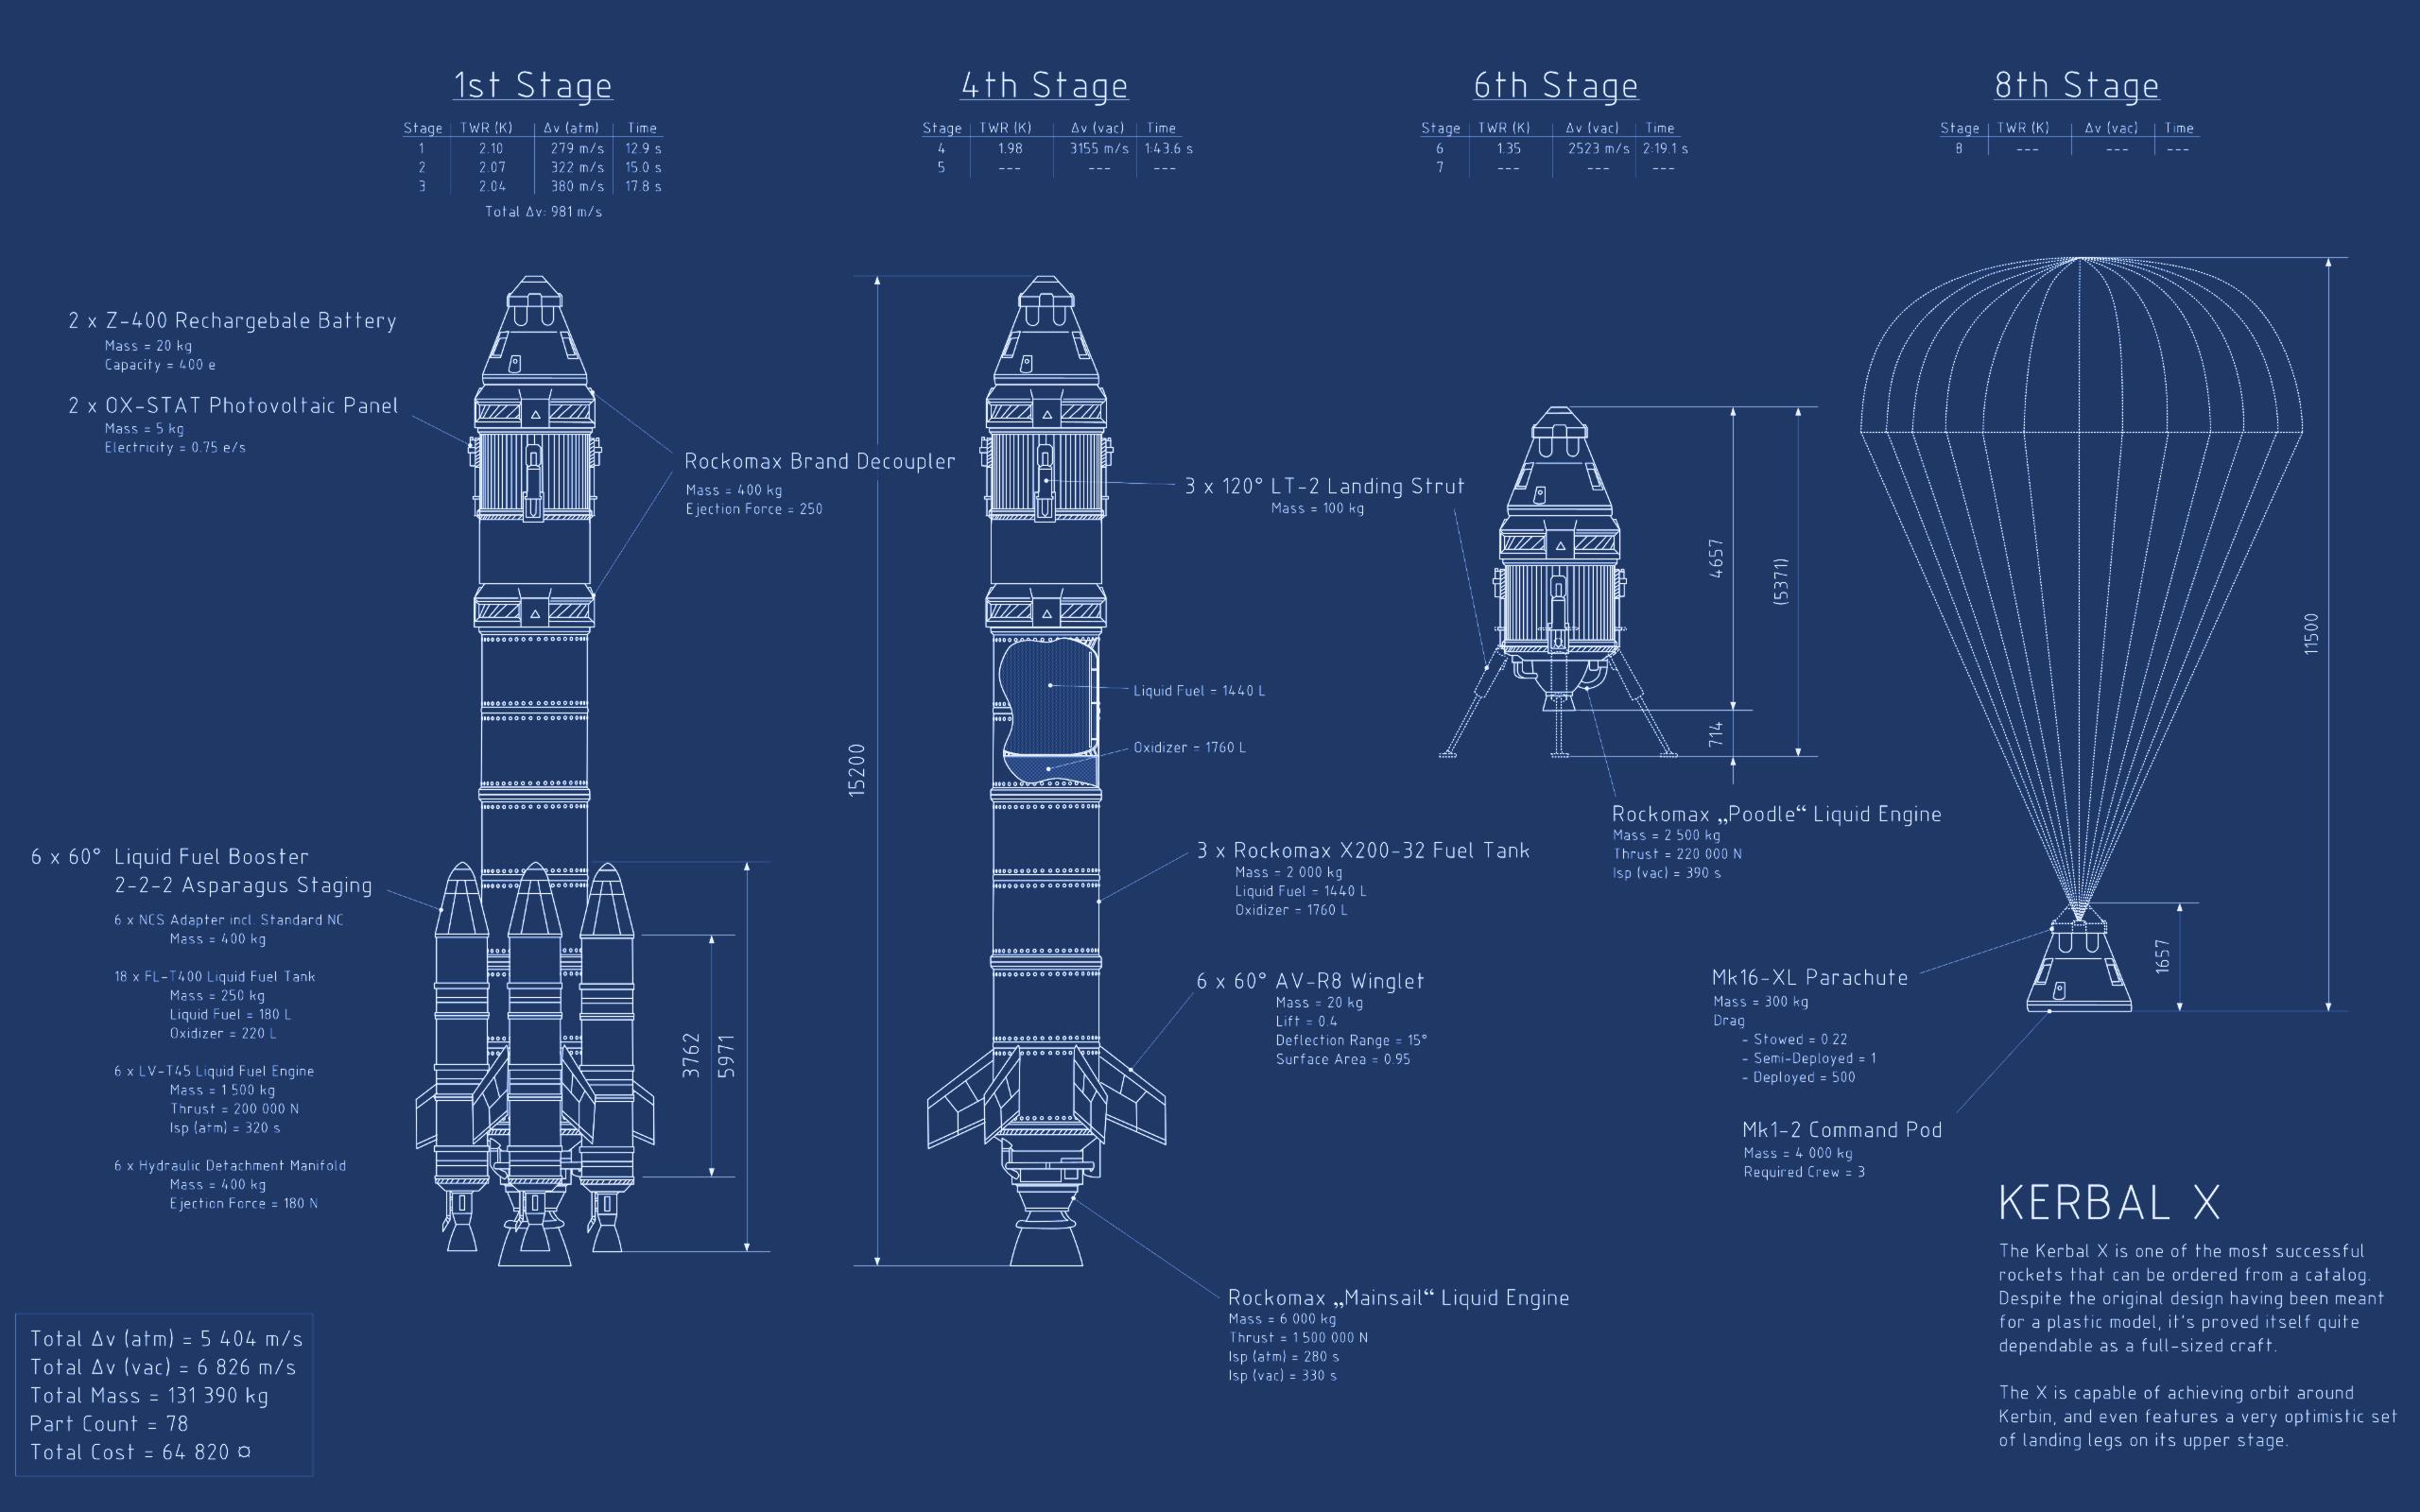 Kerbal x blueprint by smnbrnr on deviantart kerbal x blueprint by smnbrnr kerbal x blueprint by smnbrnr malvernweather Choice Image